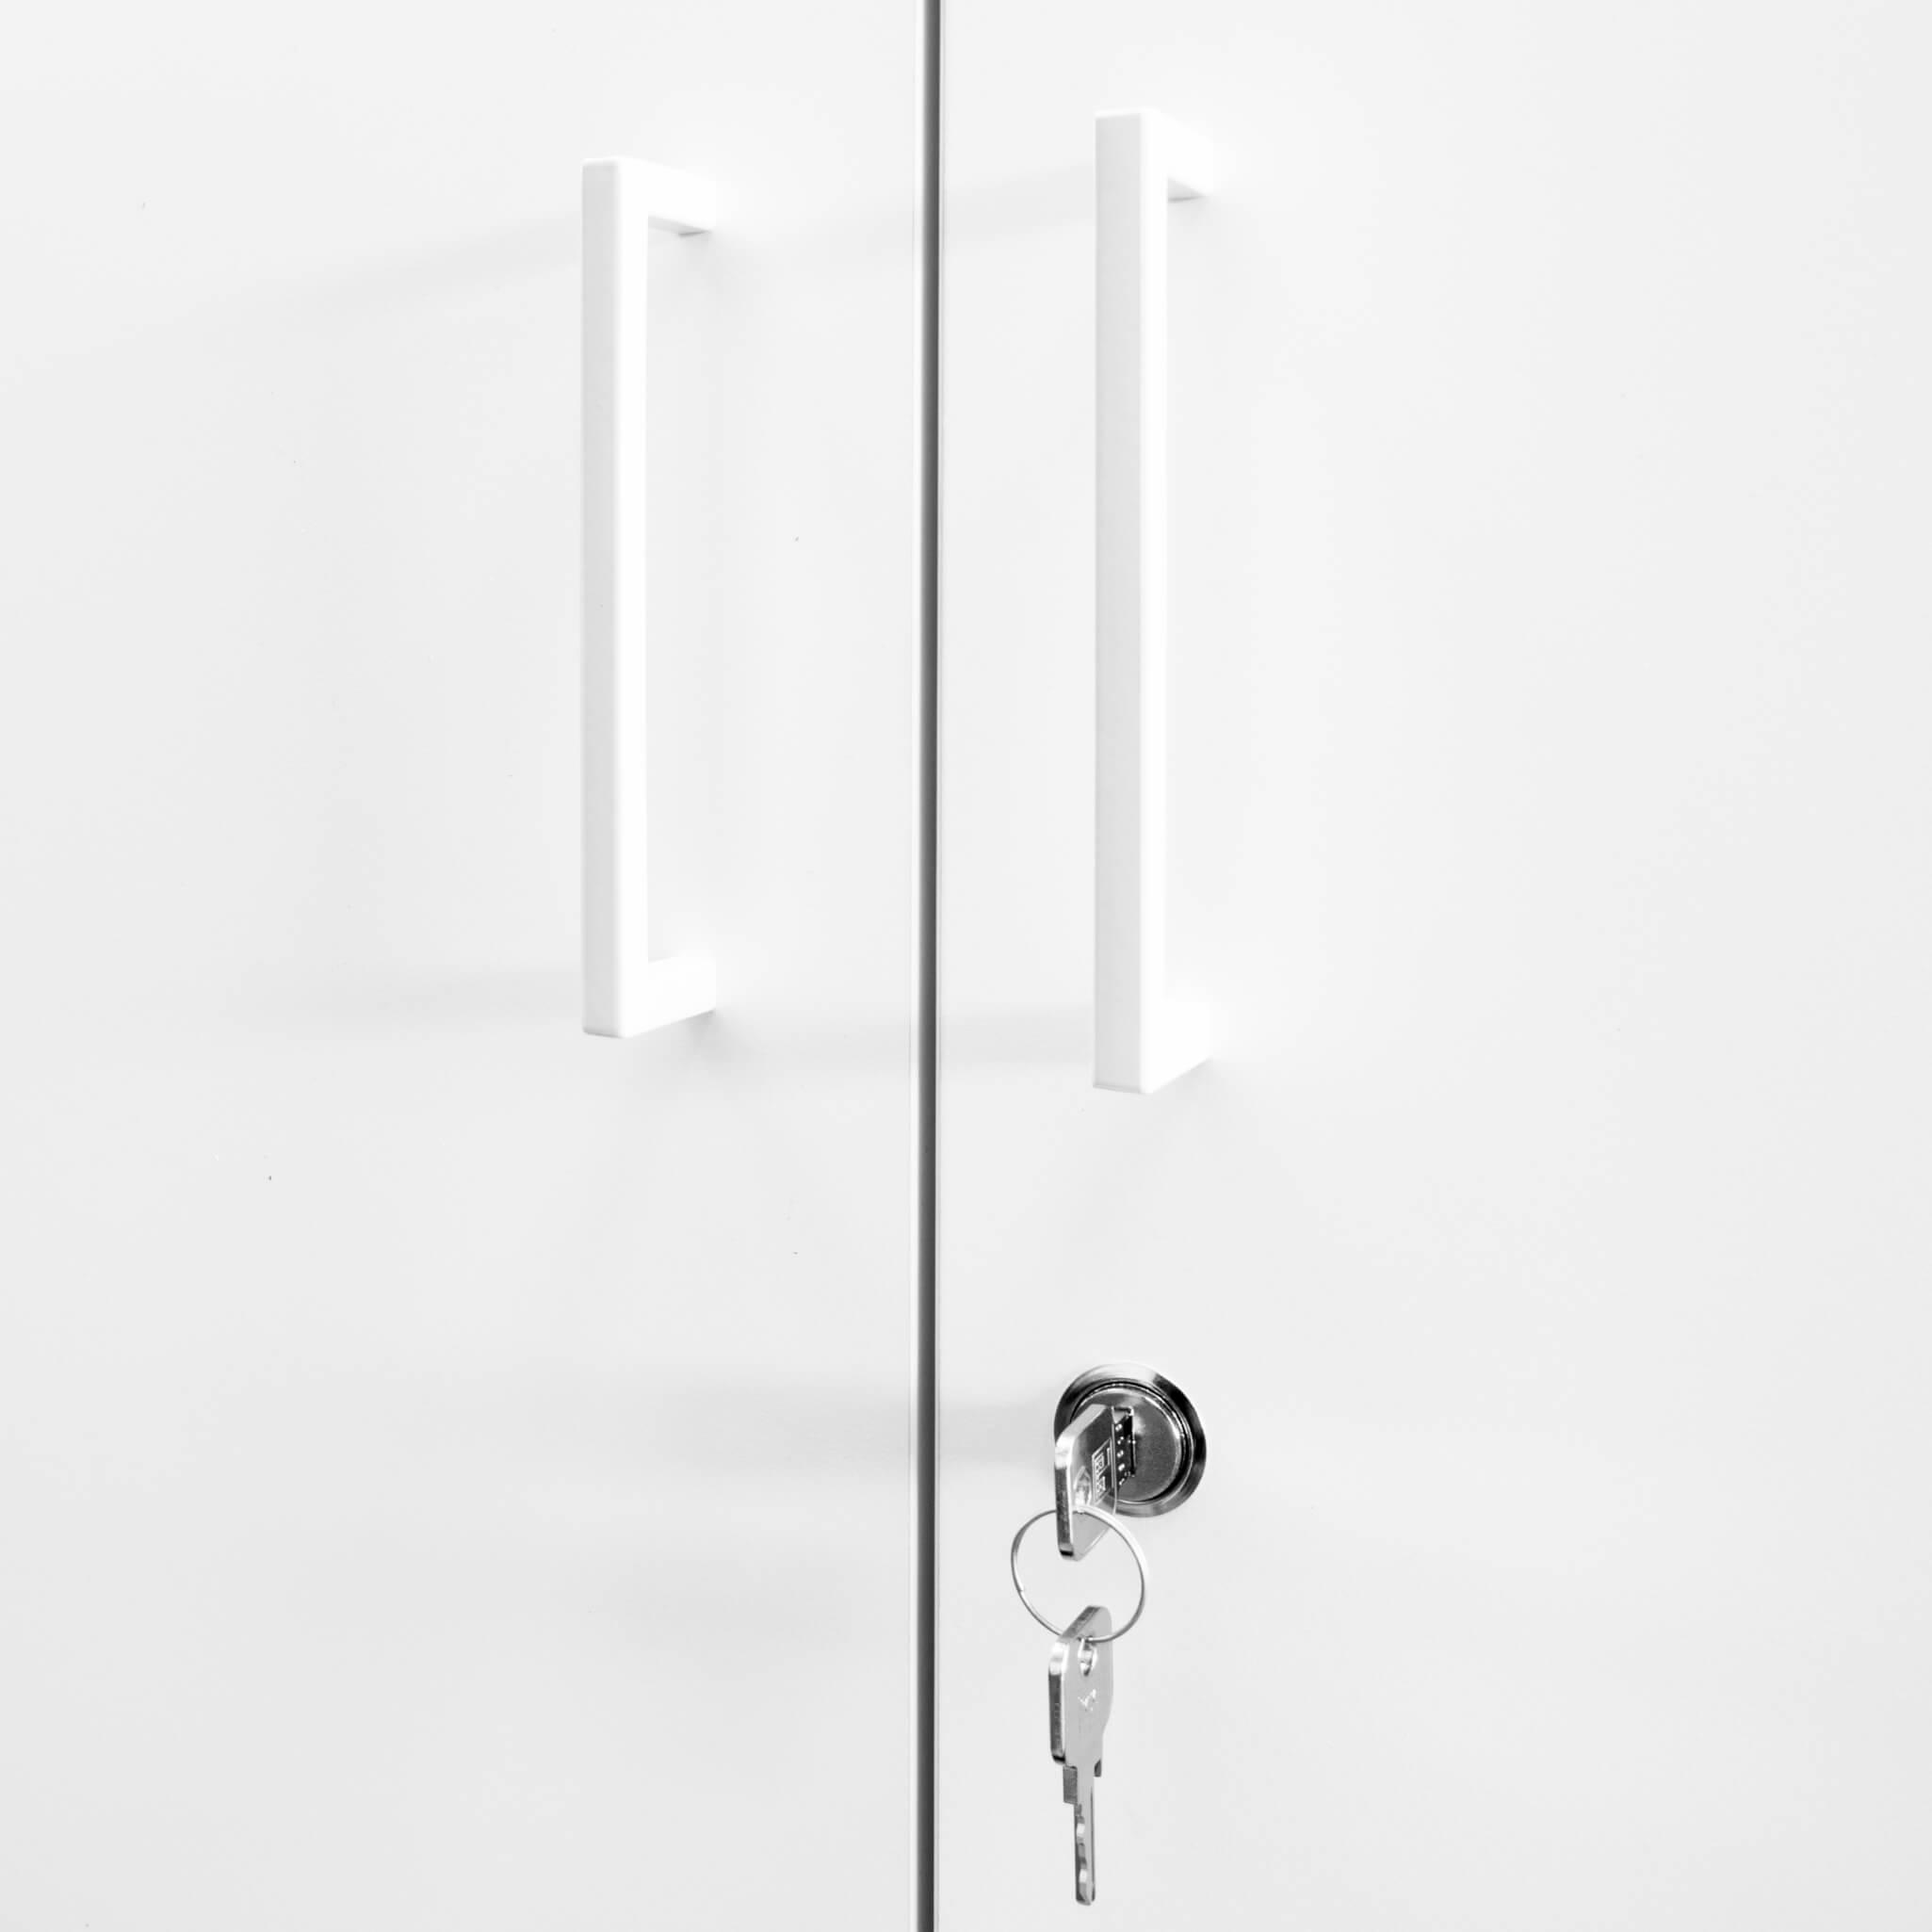 PROFI Vitrinenschrank abschließbar 5 OH Weiß-Ahorn Schrank Büroschrank Flügeltürenschrank